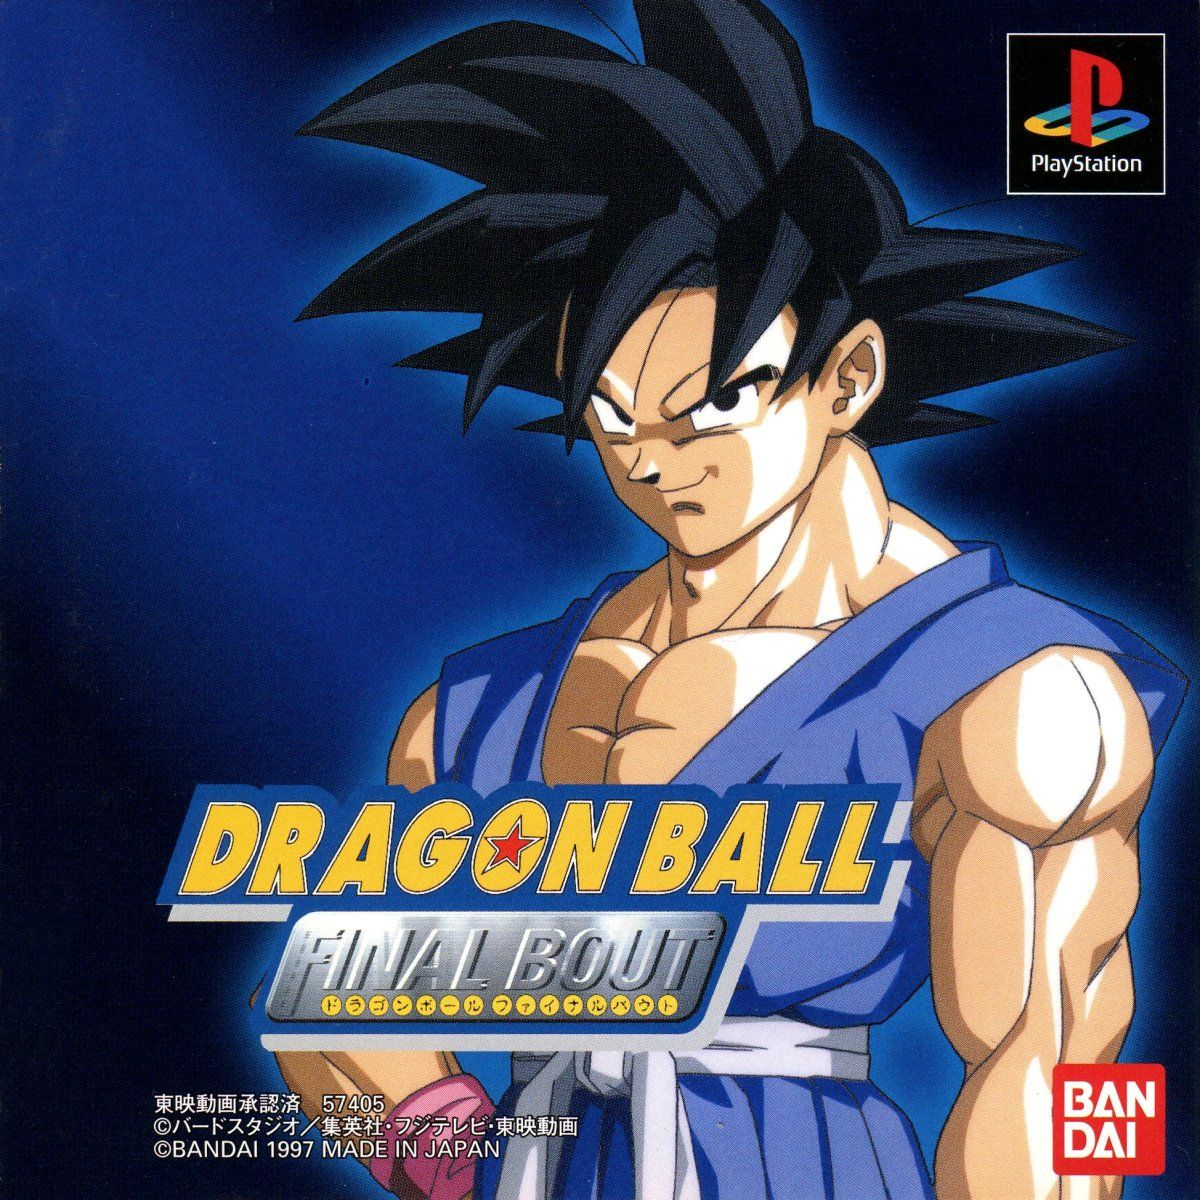 Dragon Ball Gt Final Bout Video Games Wallpapers Dragon Ball Gt Dragon Ball Wallpapers Dragon Ball Image Dragon ball gt final bout psx